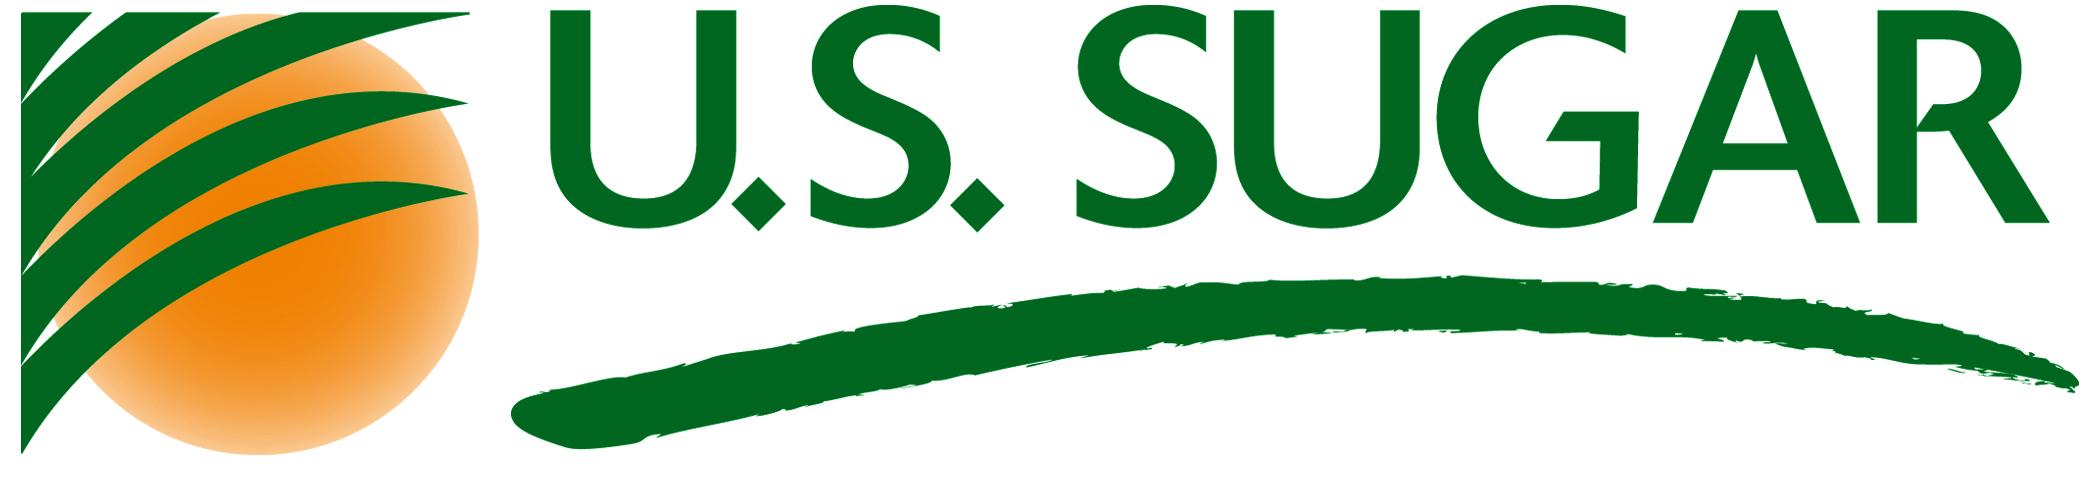 US Sugar logo copy.jpg